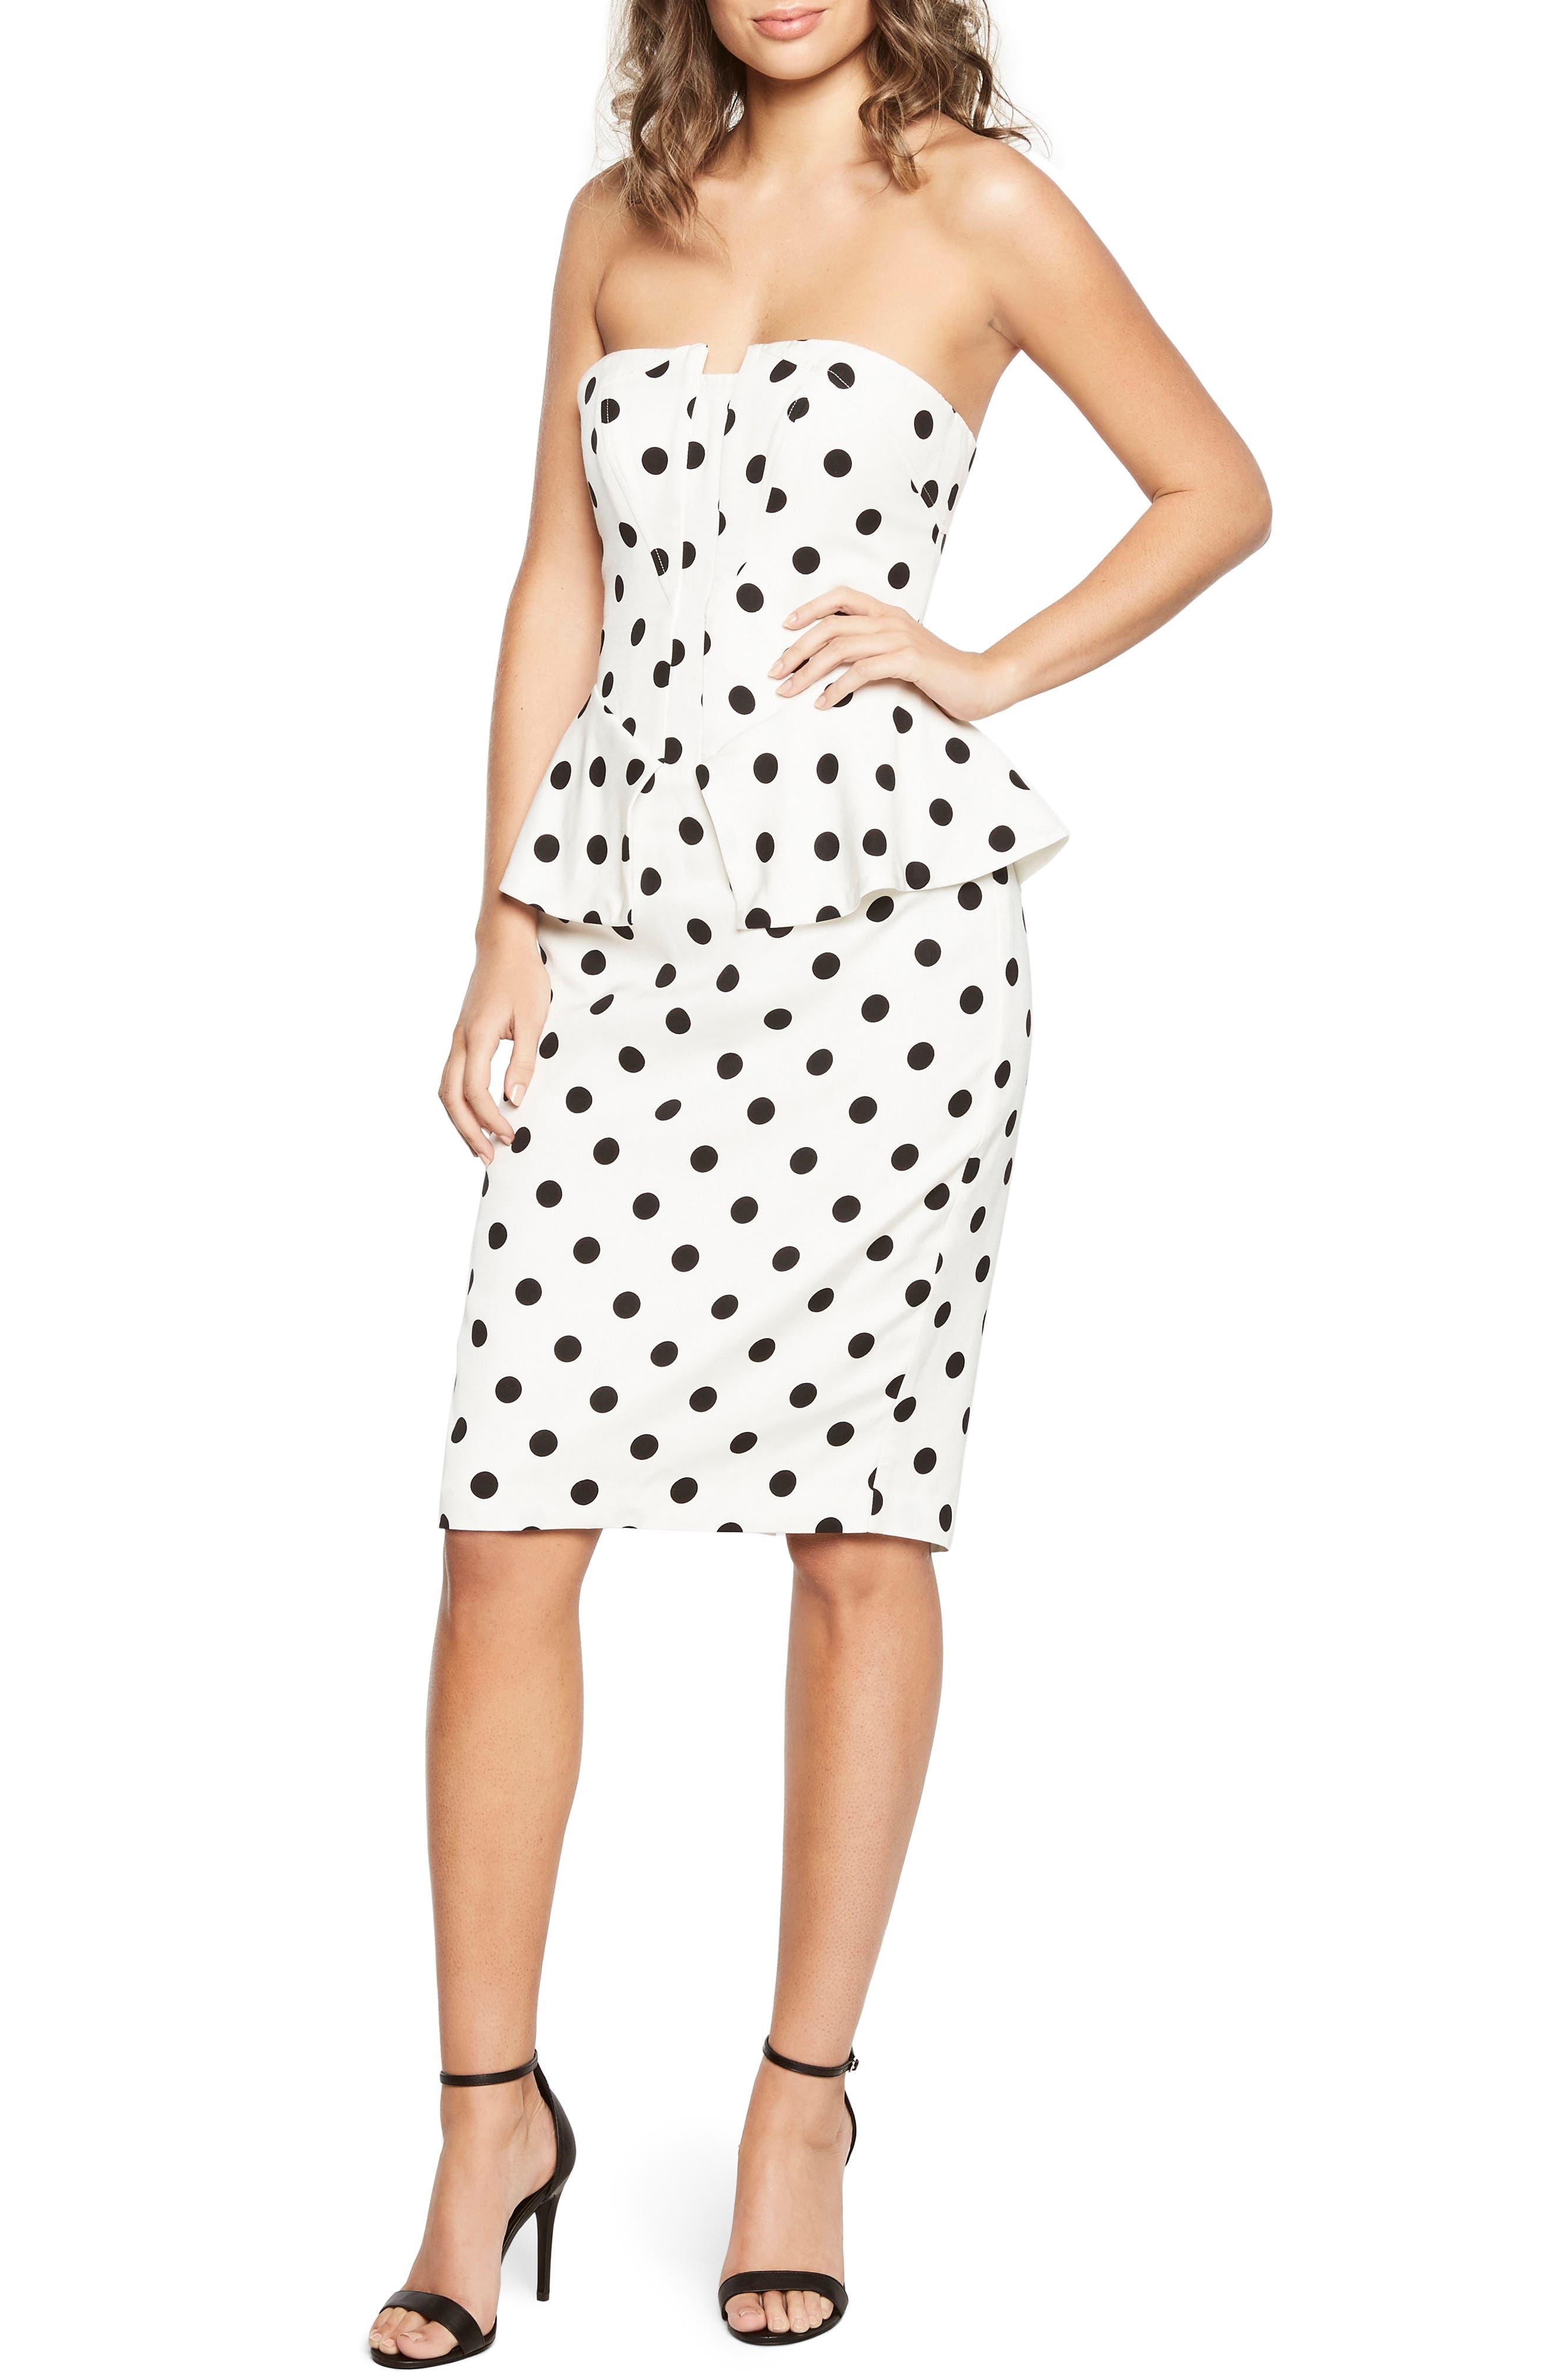 Suri Polka Dot Peplum Dress,                         Main,                         color, White Spot